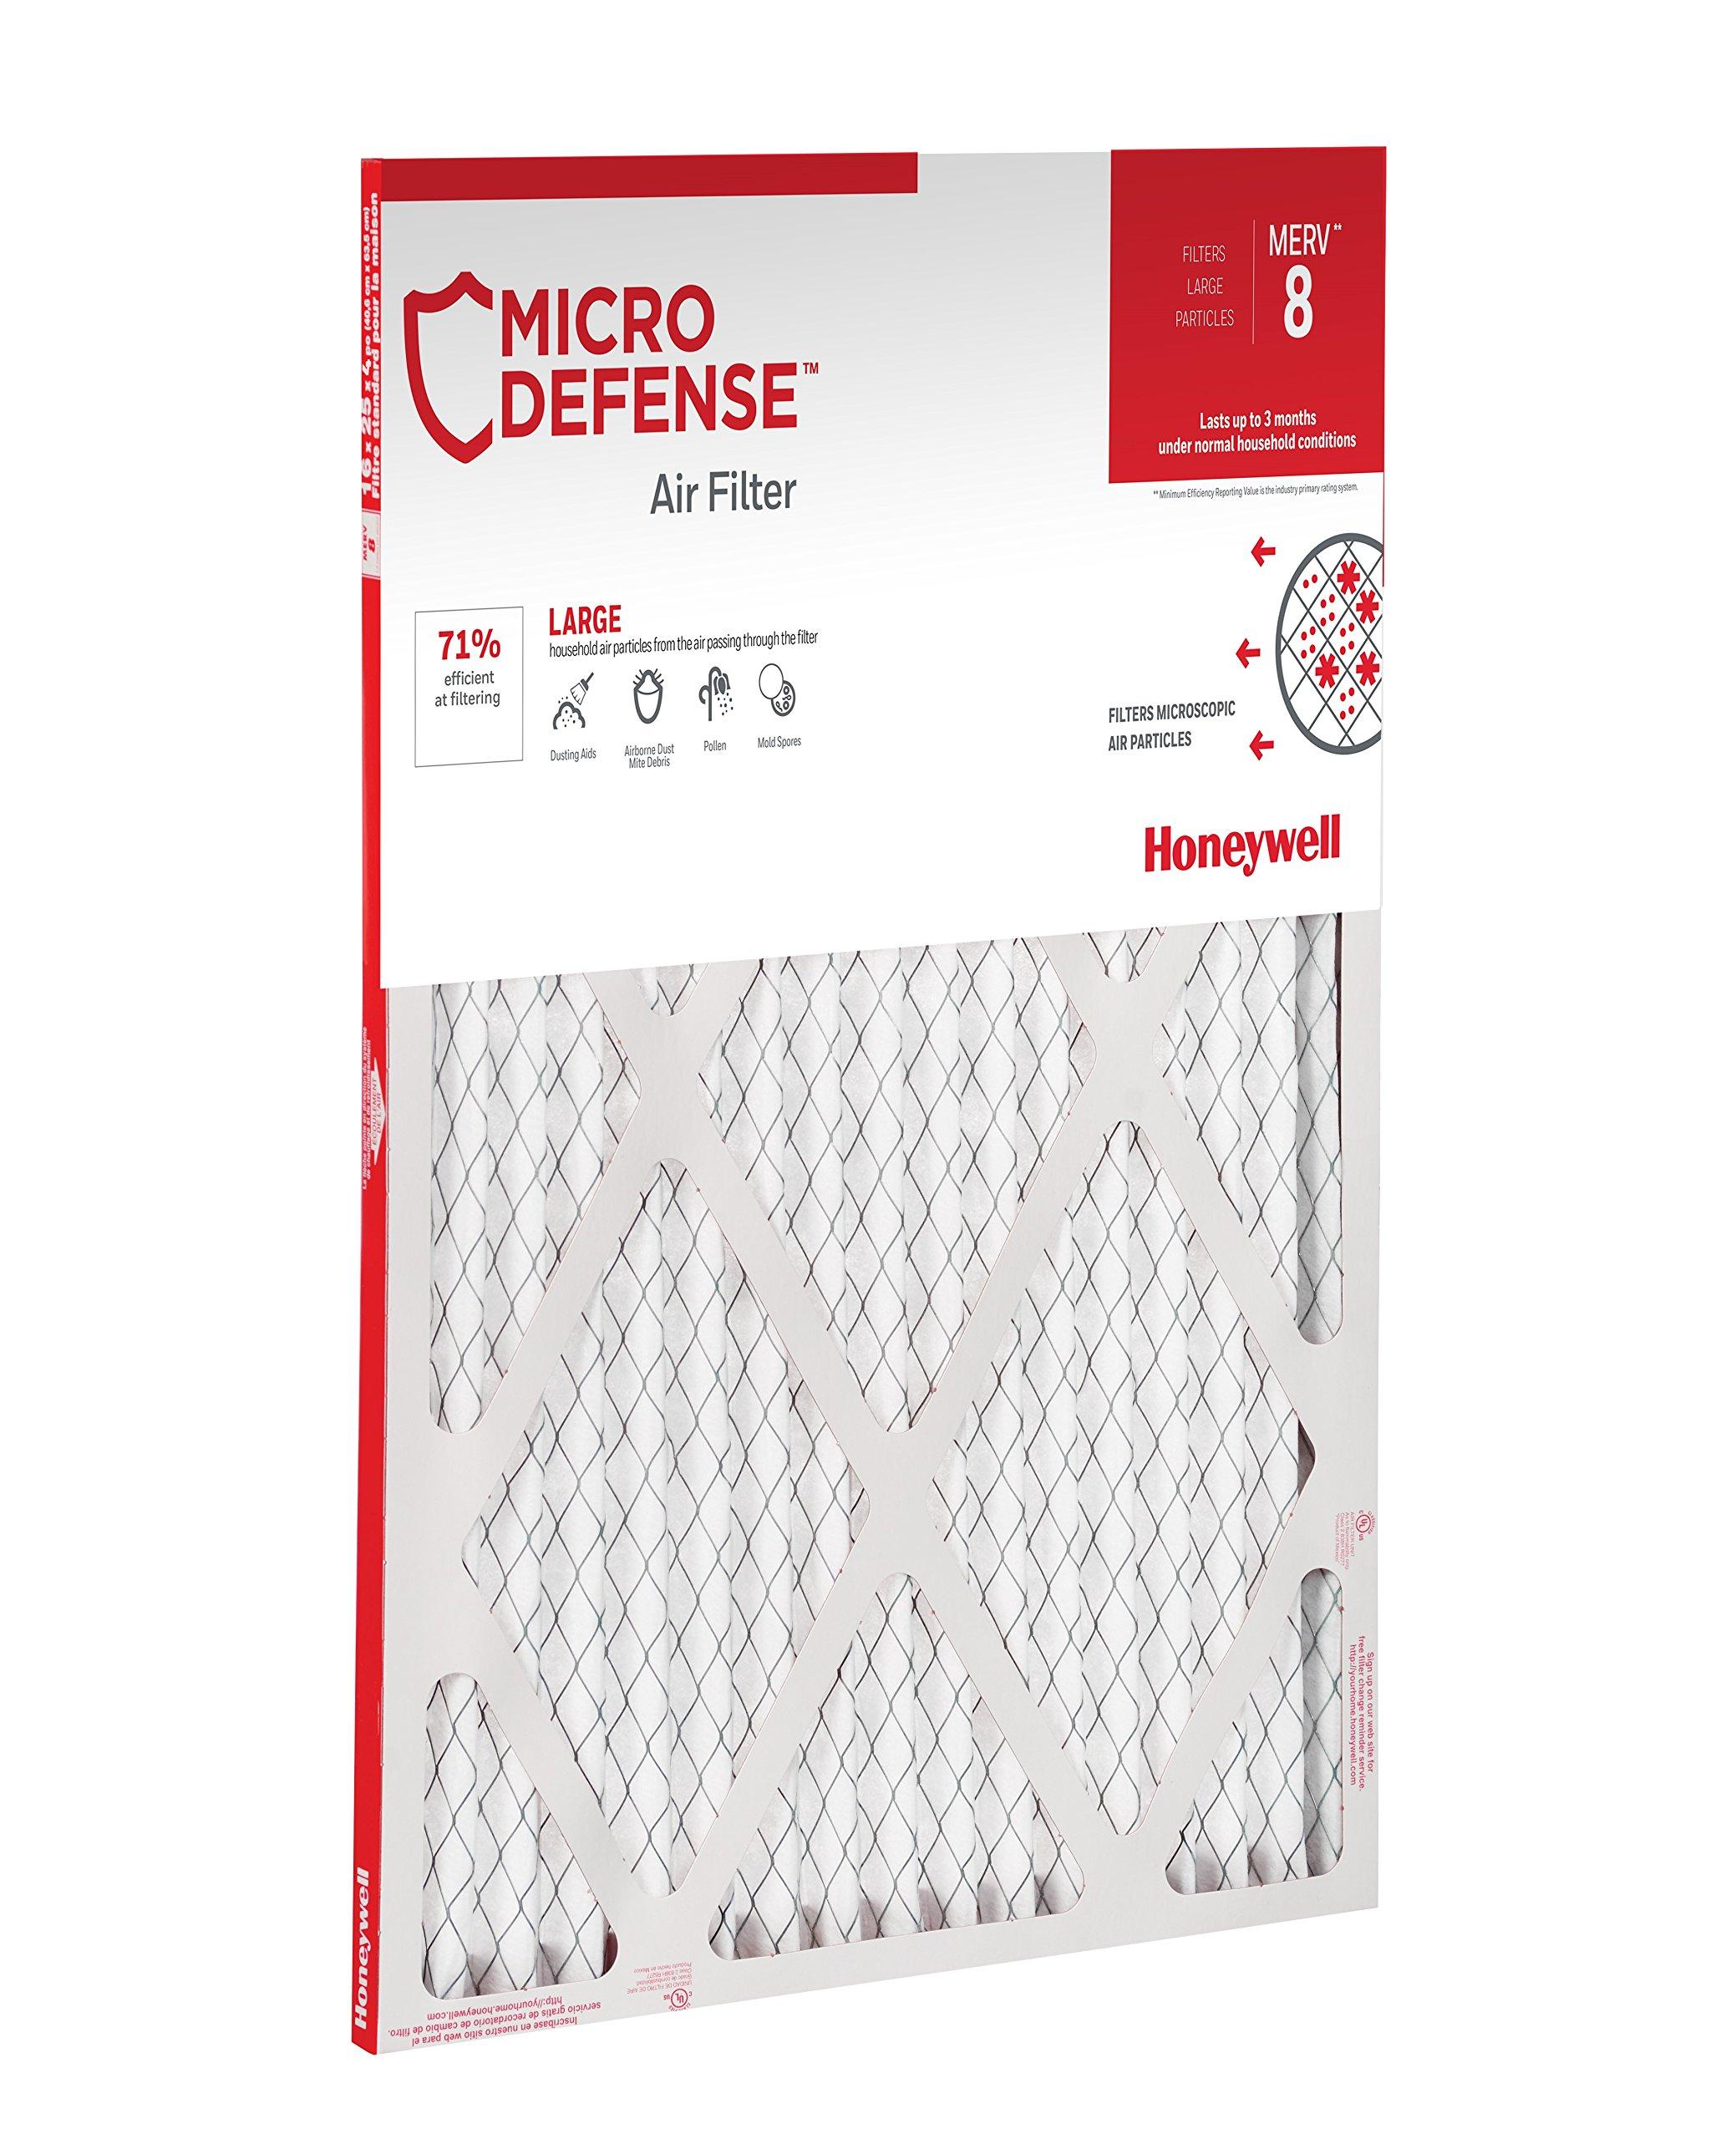 MicroDefense by Honeywell CF108A2025-2PK/C Filter, 1 inch, 20x25, MERV 8, 20x25x1